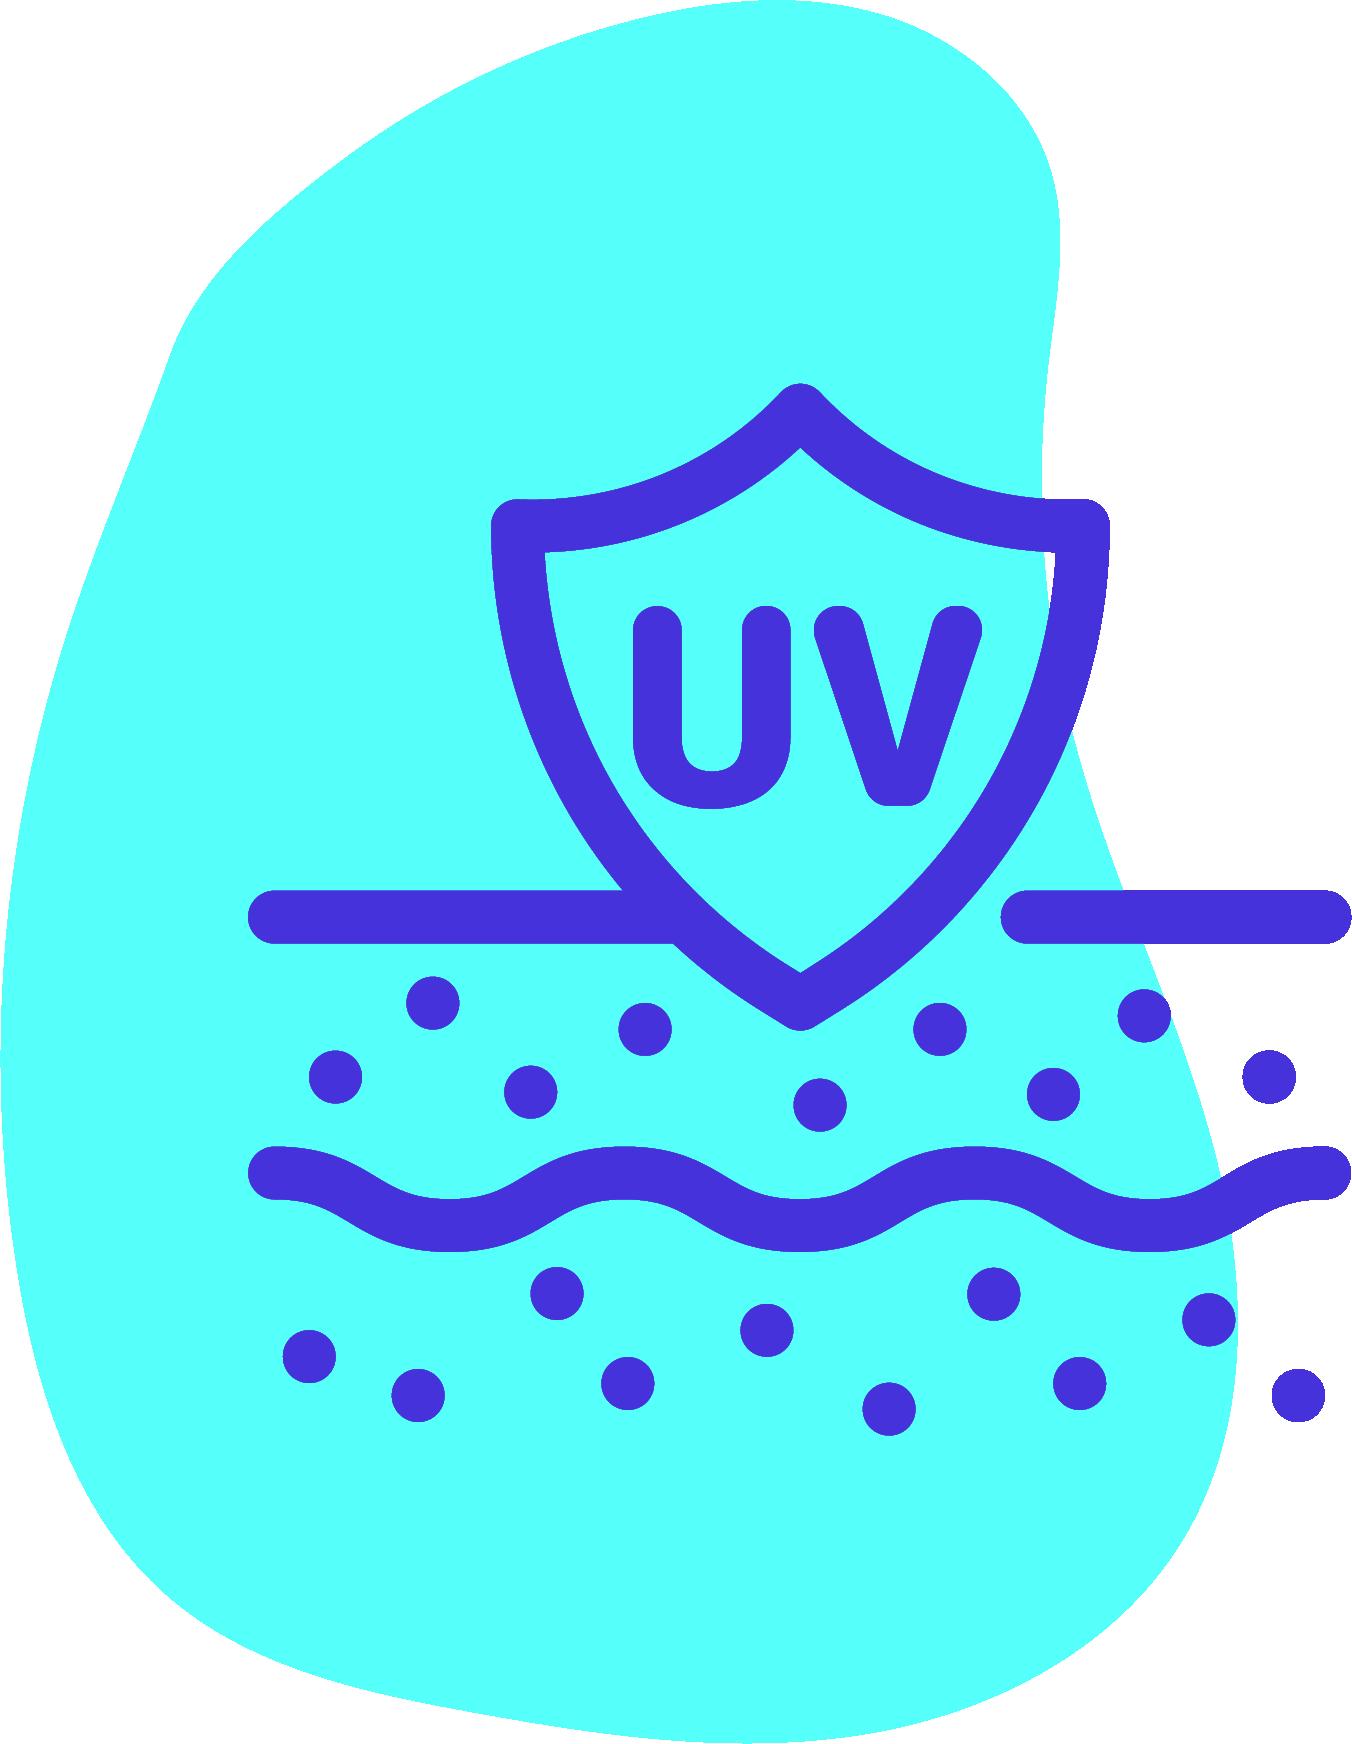 uv systems icon